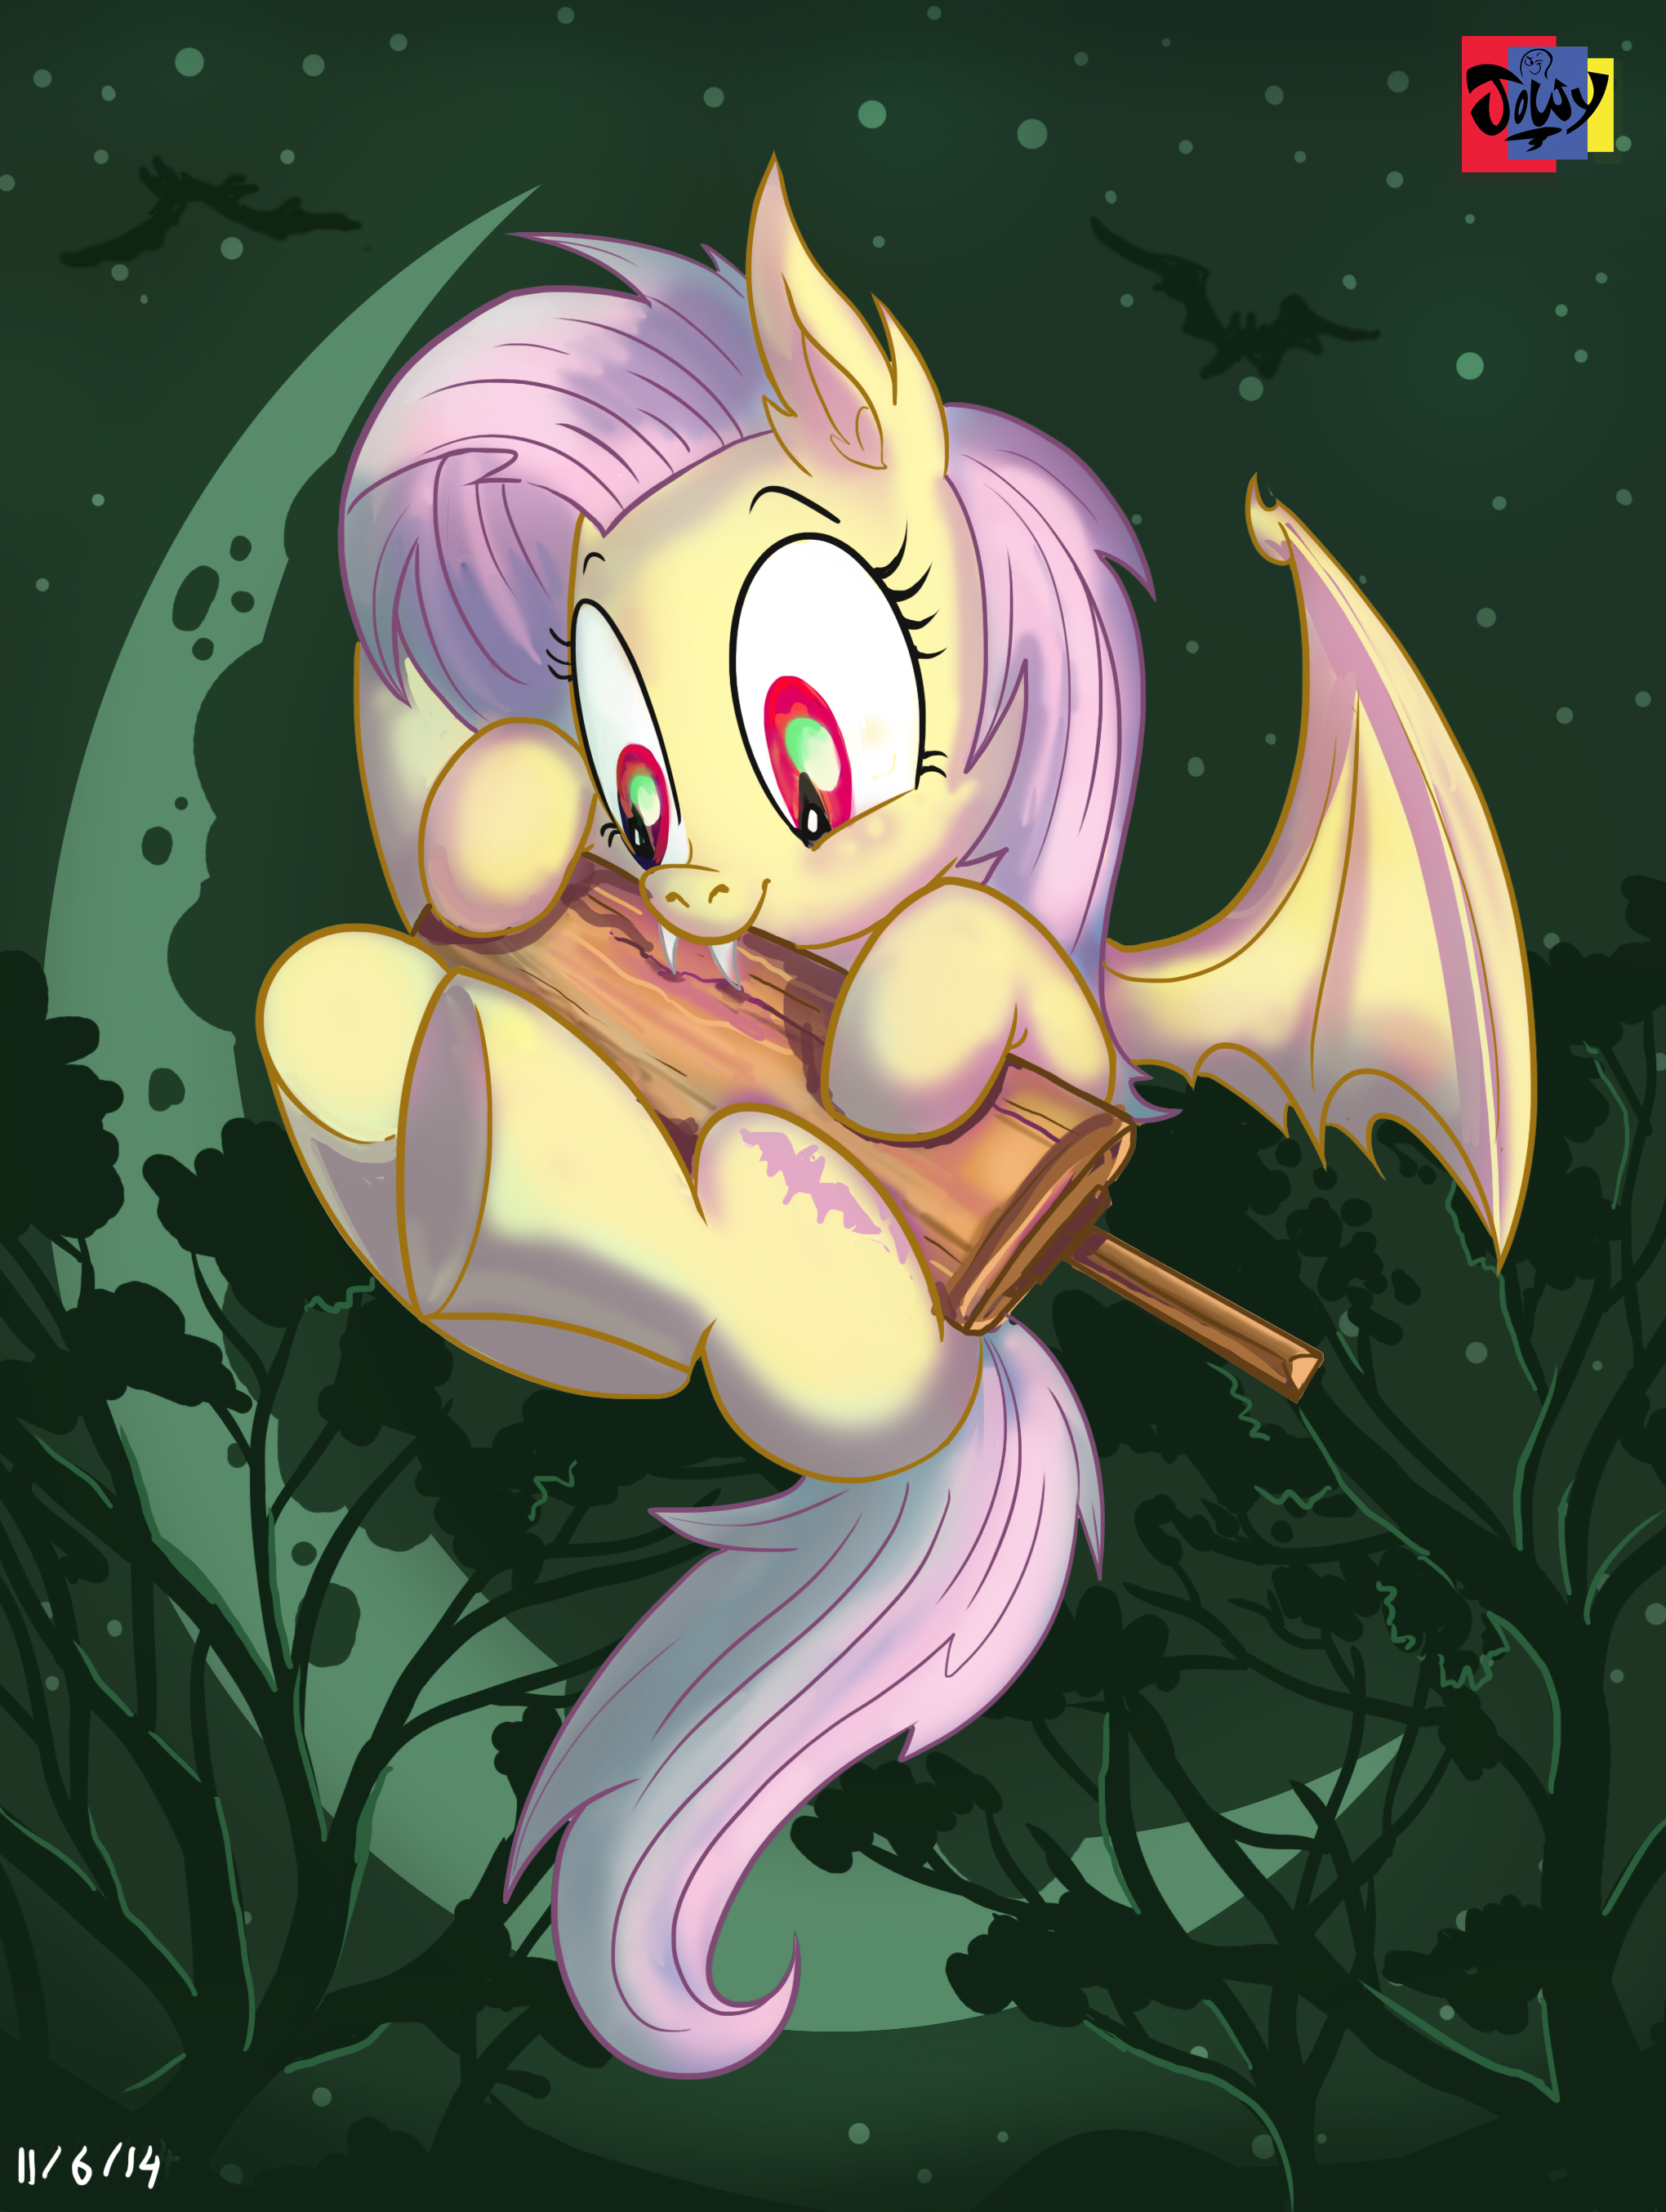 e926 2014 absurd_res bat_pony bat_wings bite cricket_bat cutie_mark equine fangs female flutterbat_(mlp) fluttershy_(mlp) flying friendship_is_magic hair hi_res hybrid jowybean mammal membranous_wings moon my_little_pony night outside pink_hair red_eyes small_wings solo tree wings